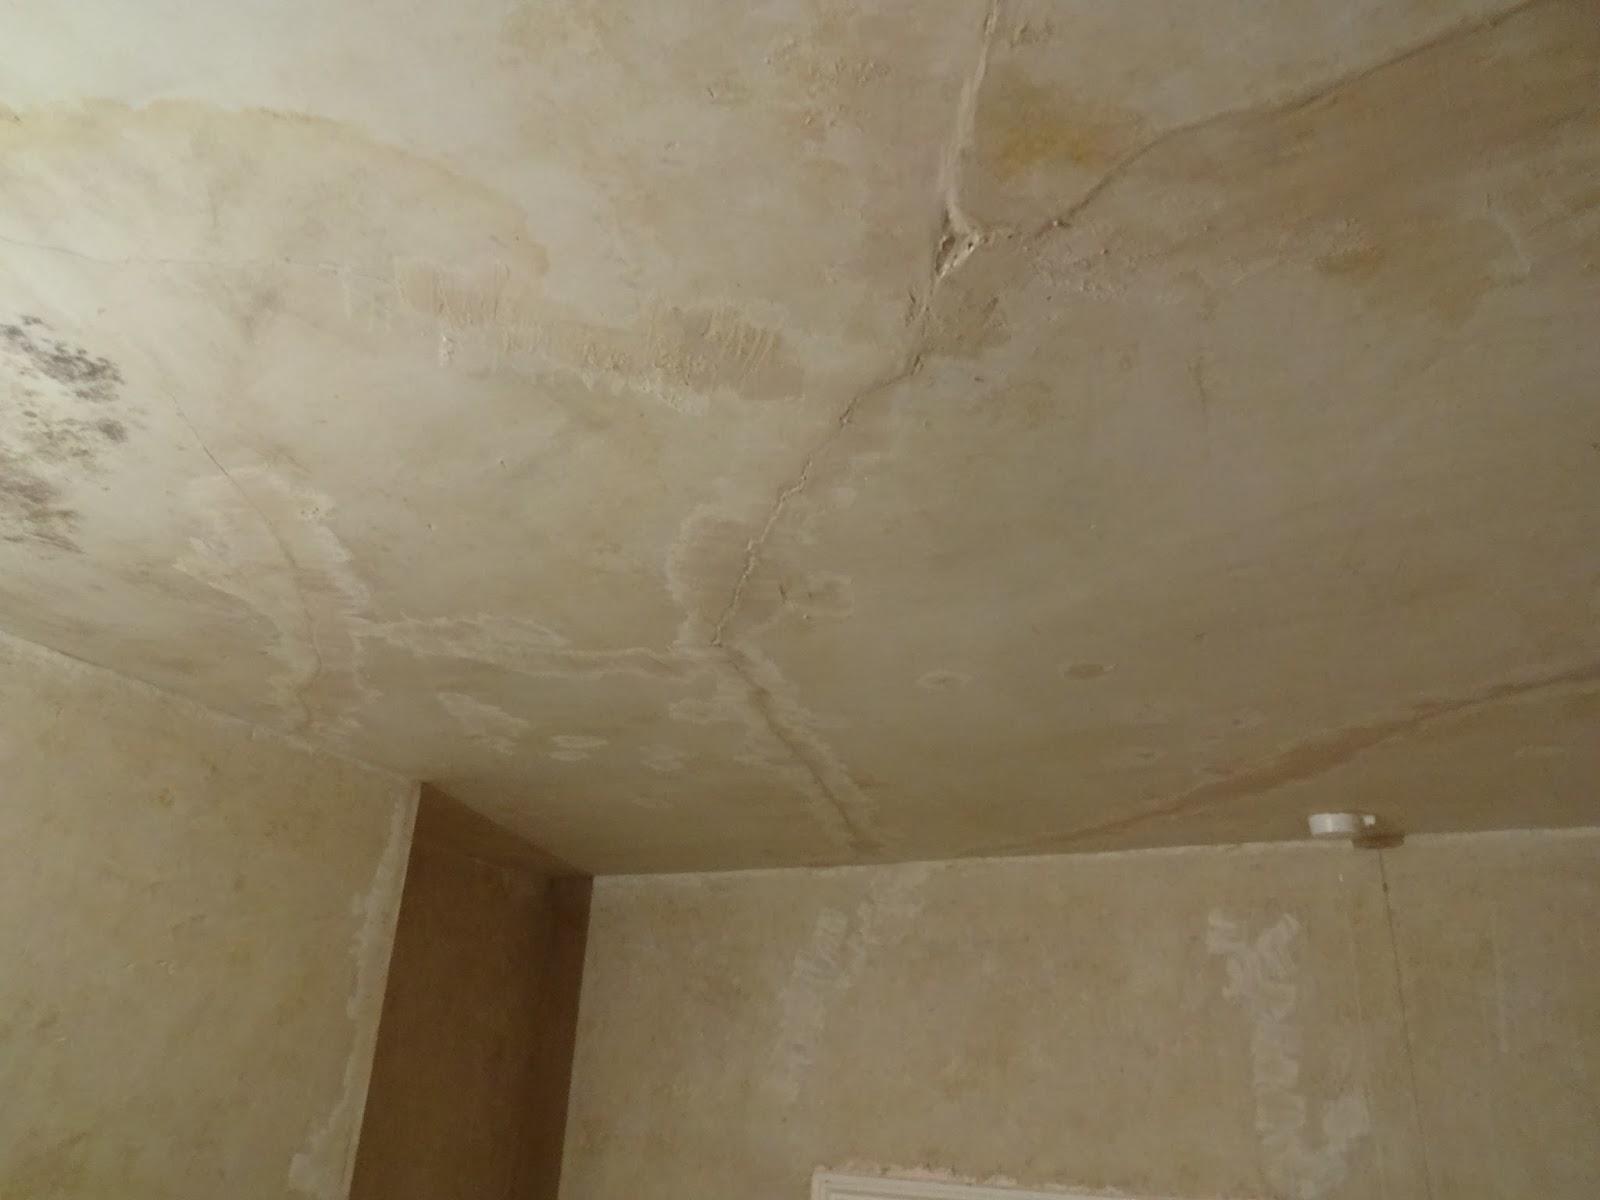 Repair cracked ceiling